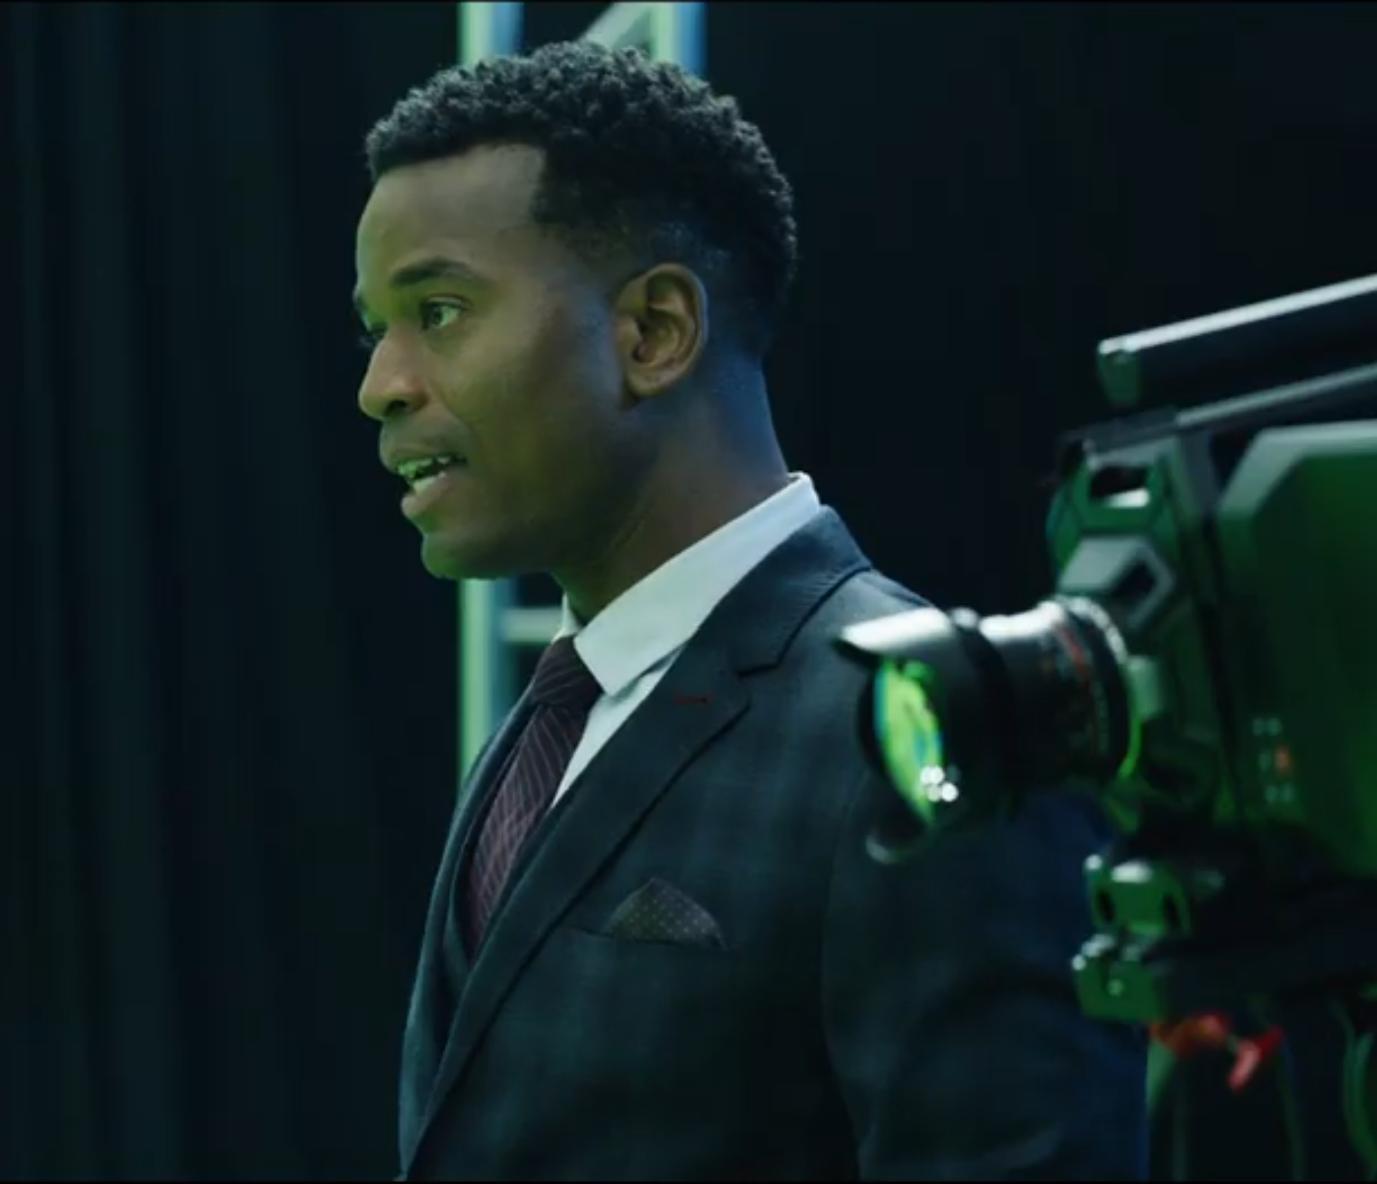 Hulu Has Live Sports Commercial w/ Saquon Barkley (New York Giants - NFL)